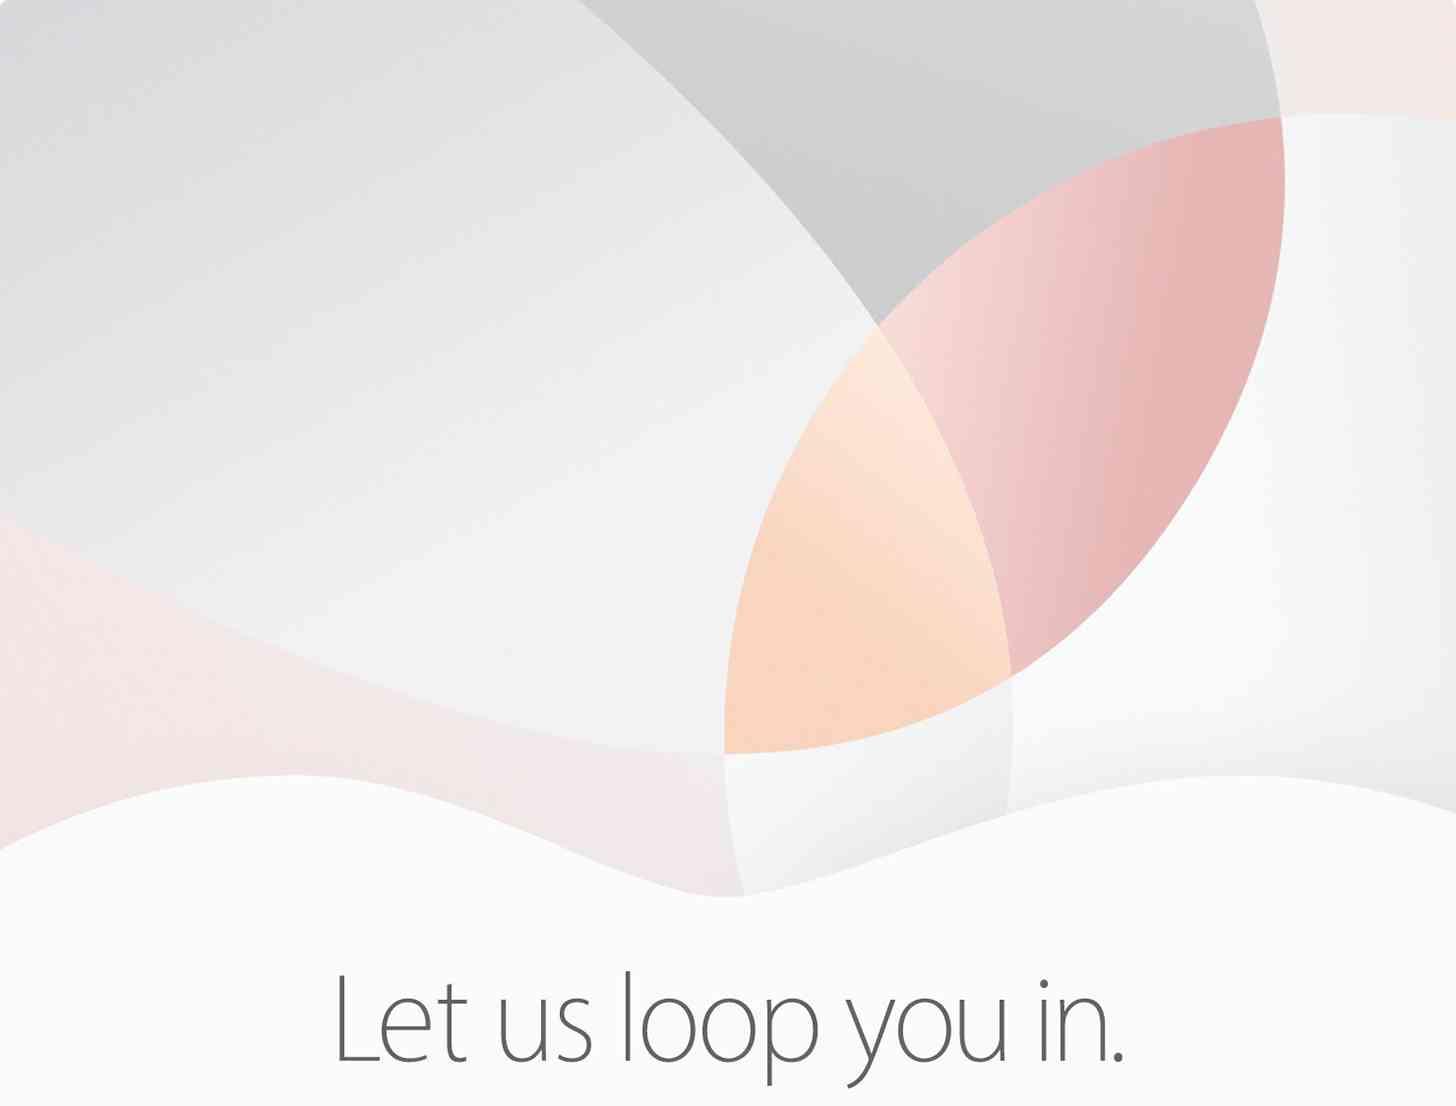 Apple March 21 event invite large